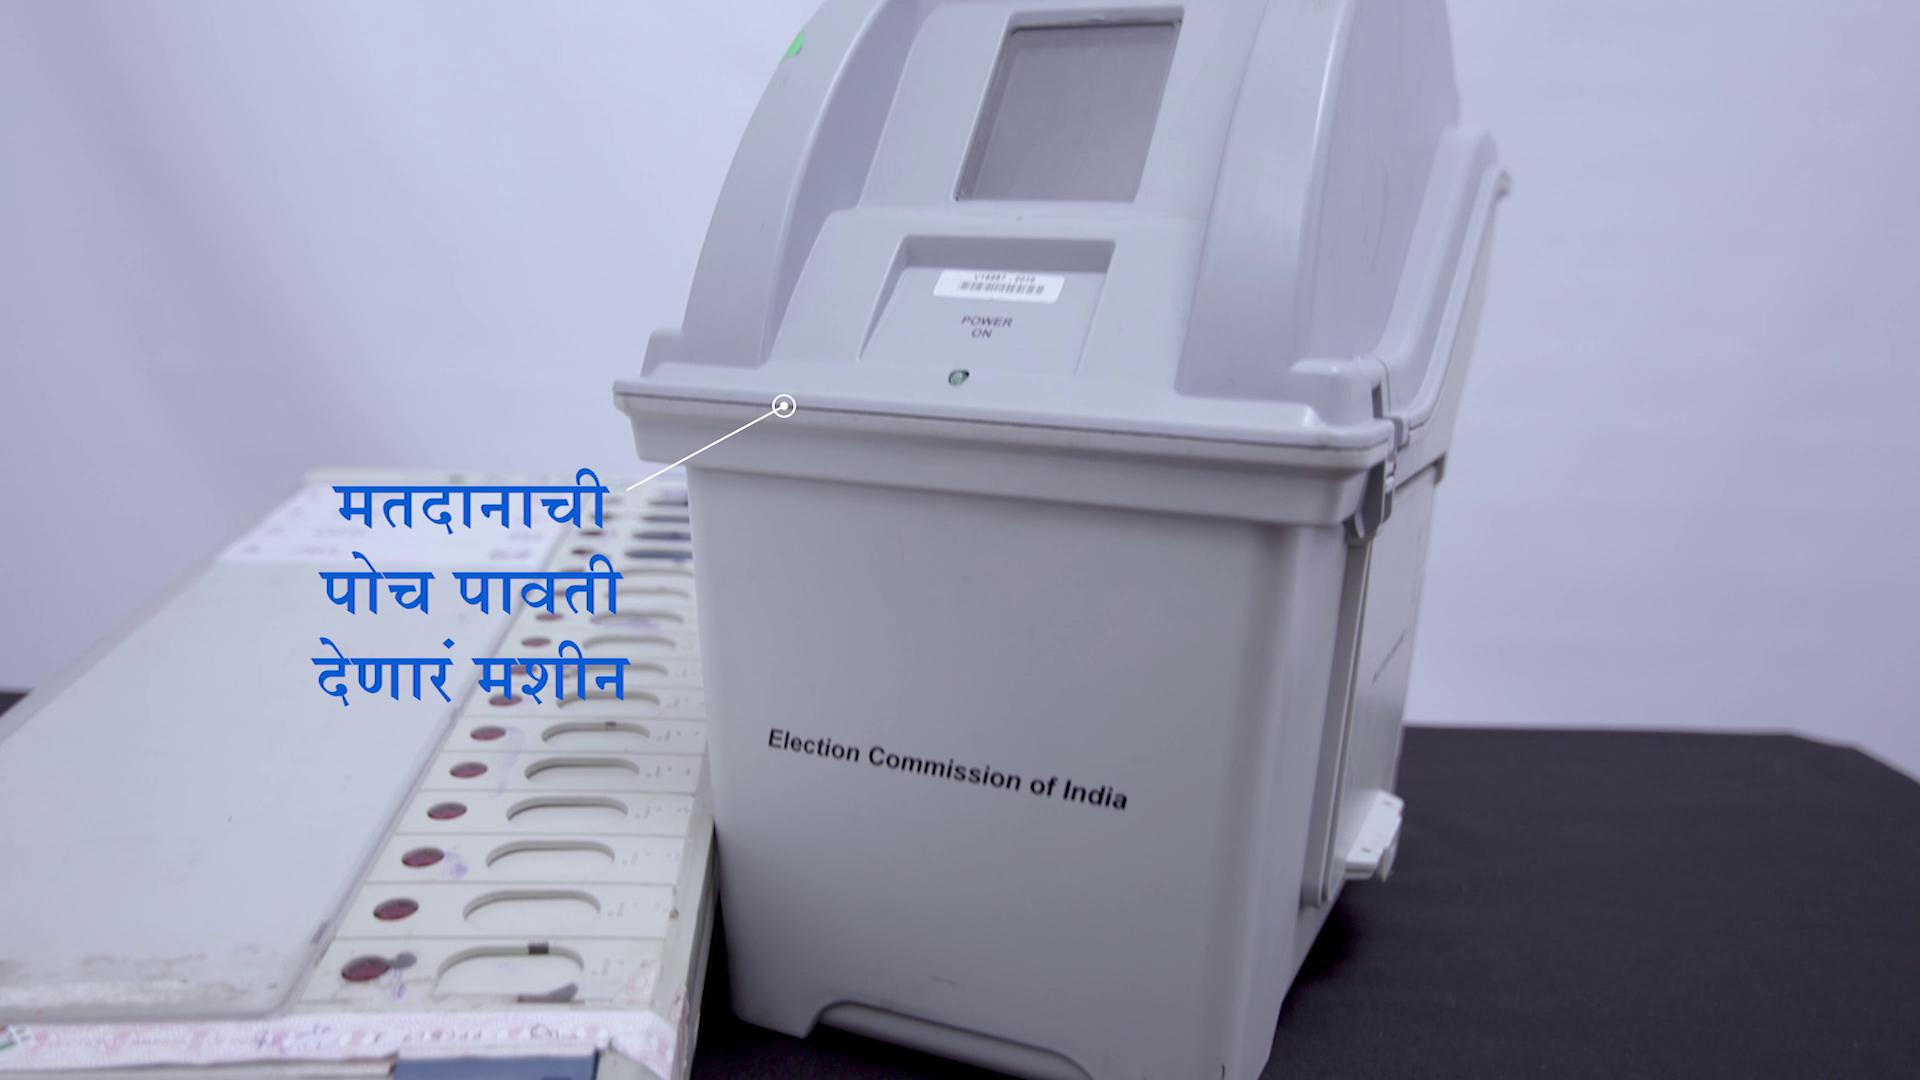 VVPAT awareness video 60 seconds - Marathi - EVM, VVPAT and